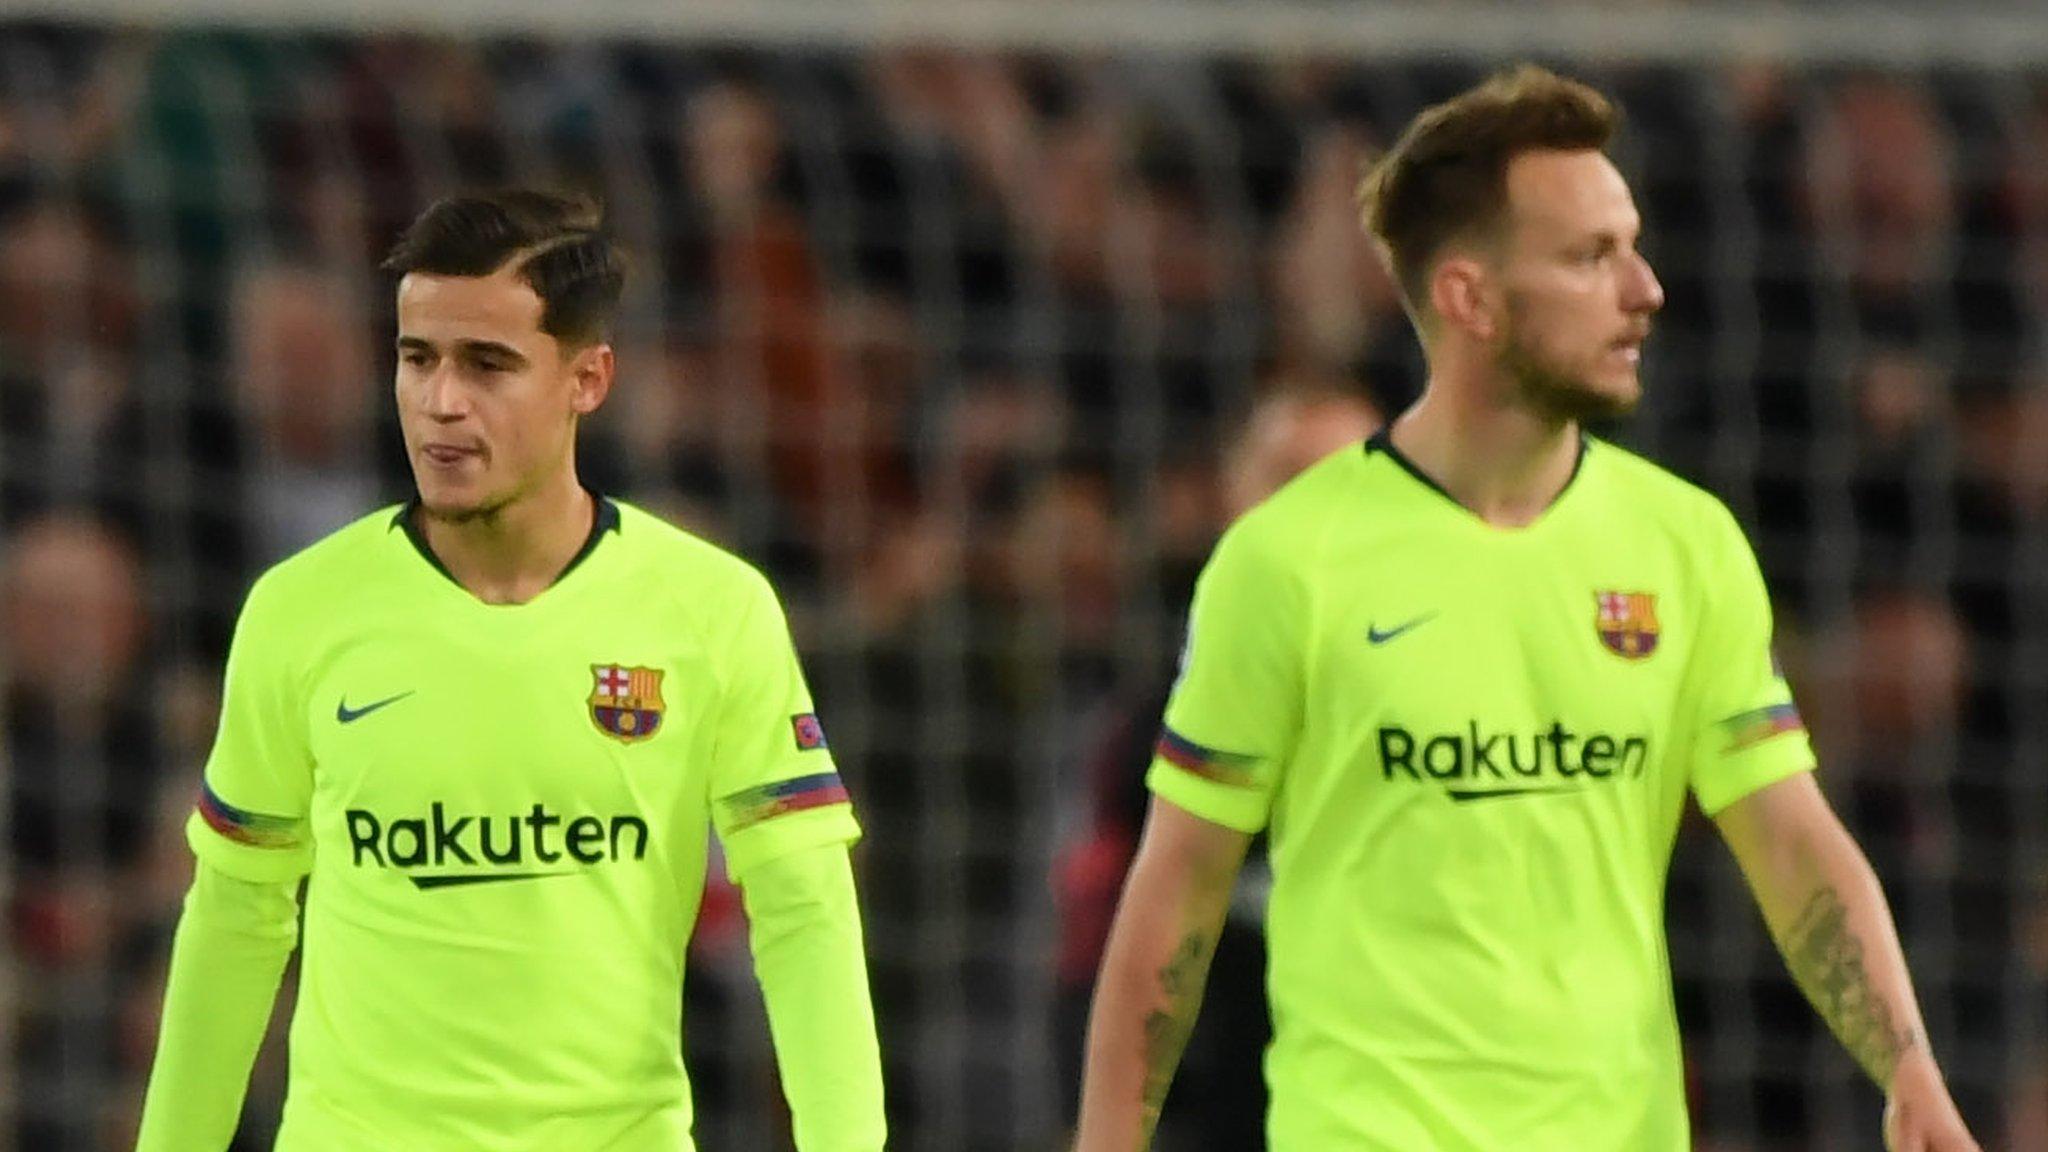 Football gossip: Rakitic, Coutinho, Cahill, Neymar, Bale, Ndombele